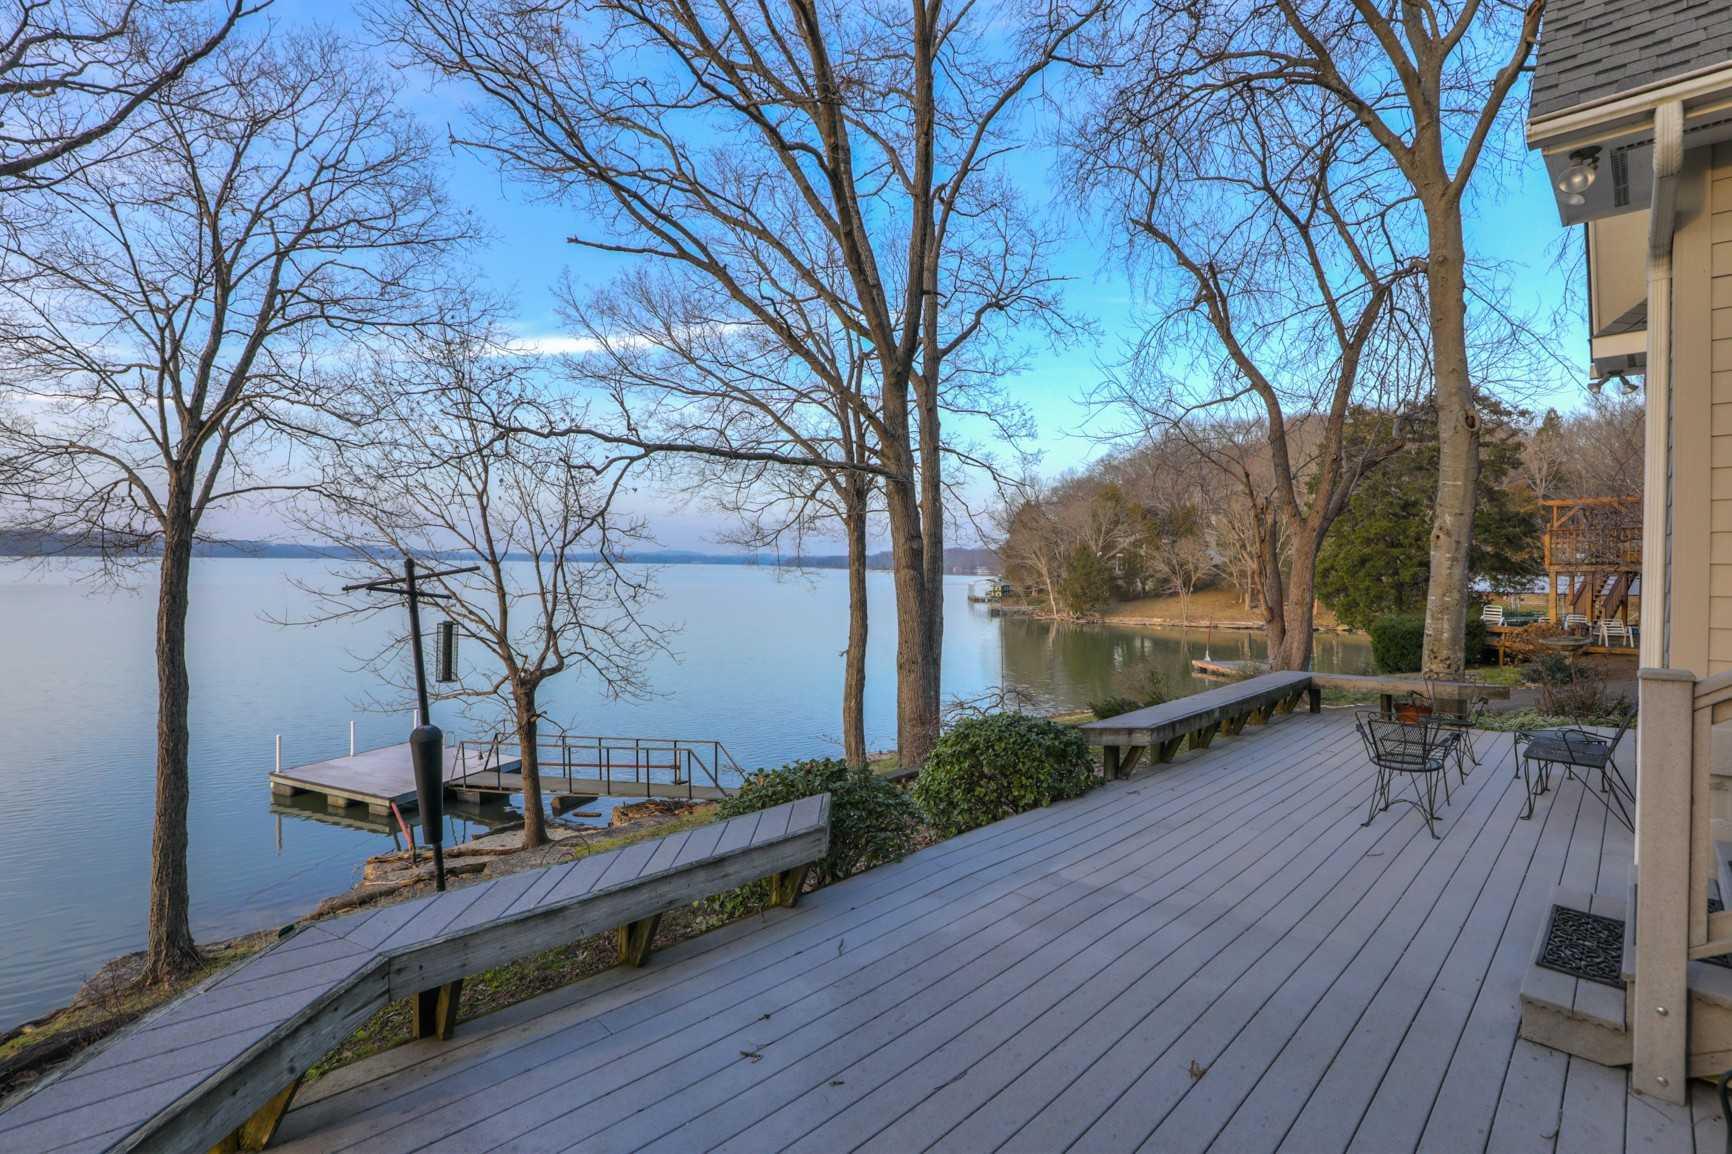 $895,000 - 3Br/3Ba -  for Sale in Glen Hills 2, Mount Juliet